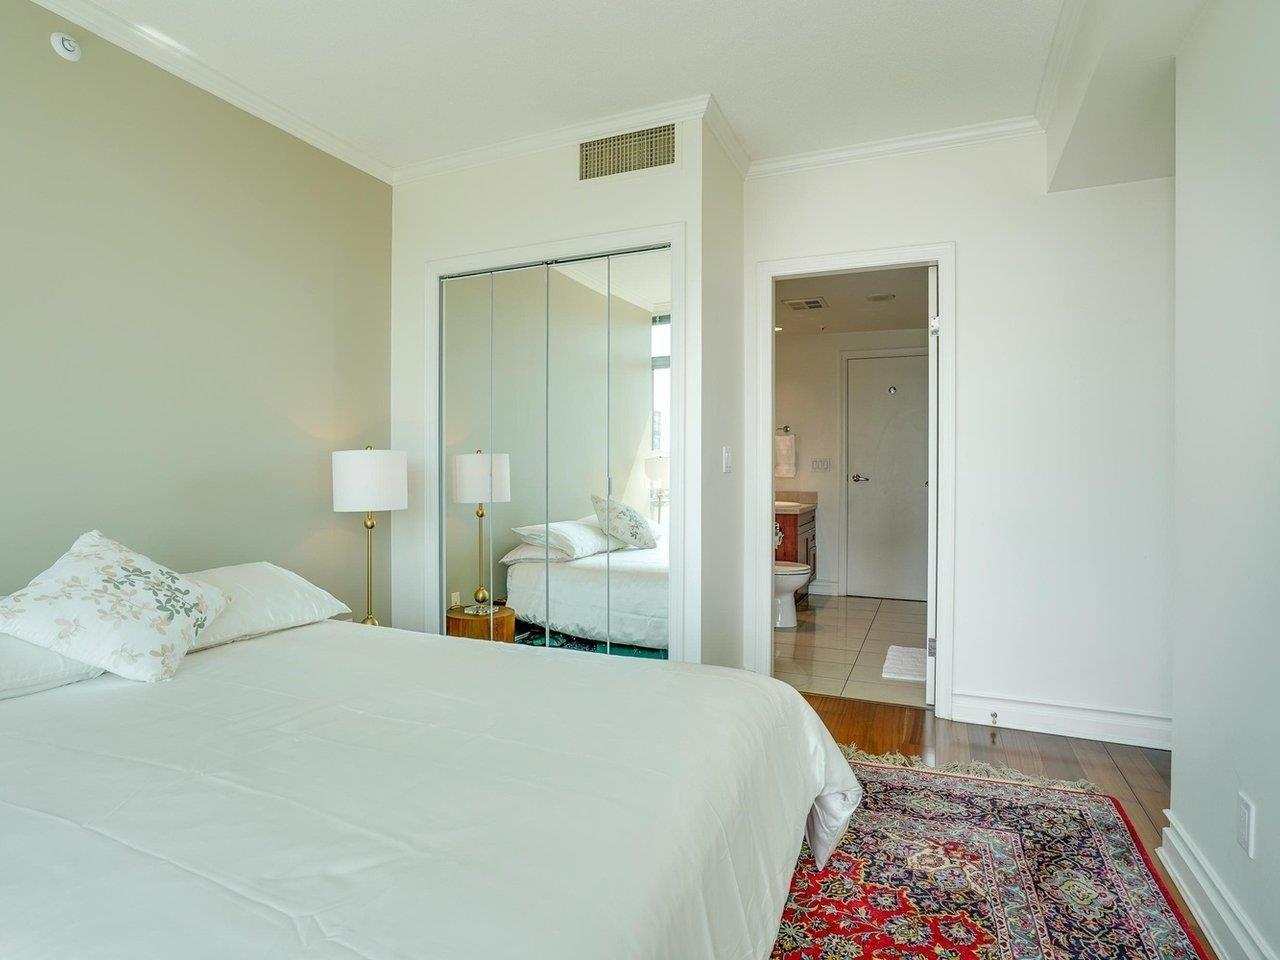 1003 1790 BAYSHORE DRIVE - Coal Harbour Apartment/Condo for sale, 1 Bedroom (R2606481) - #19